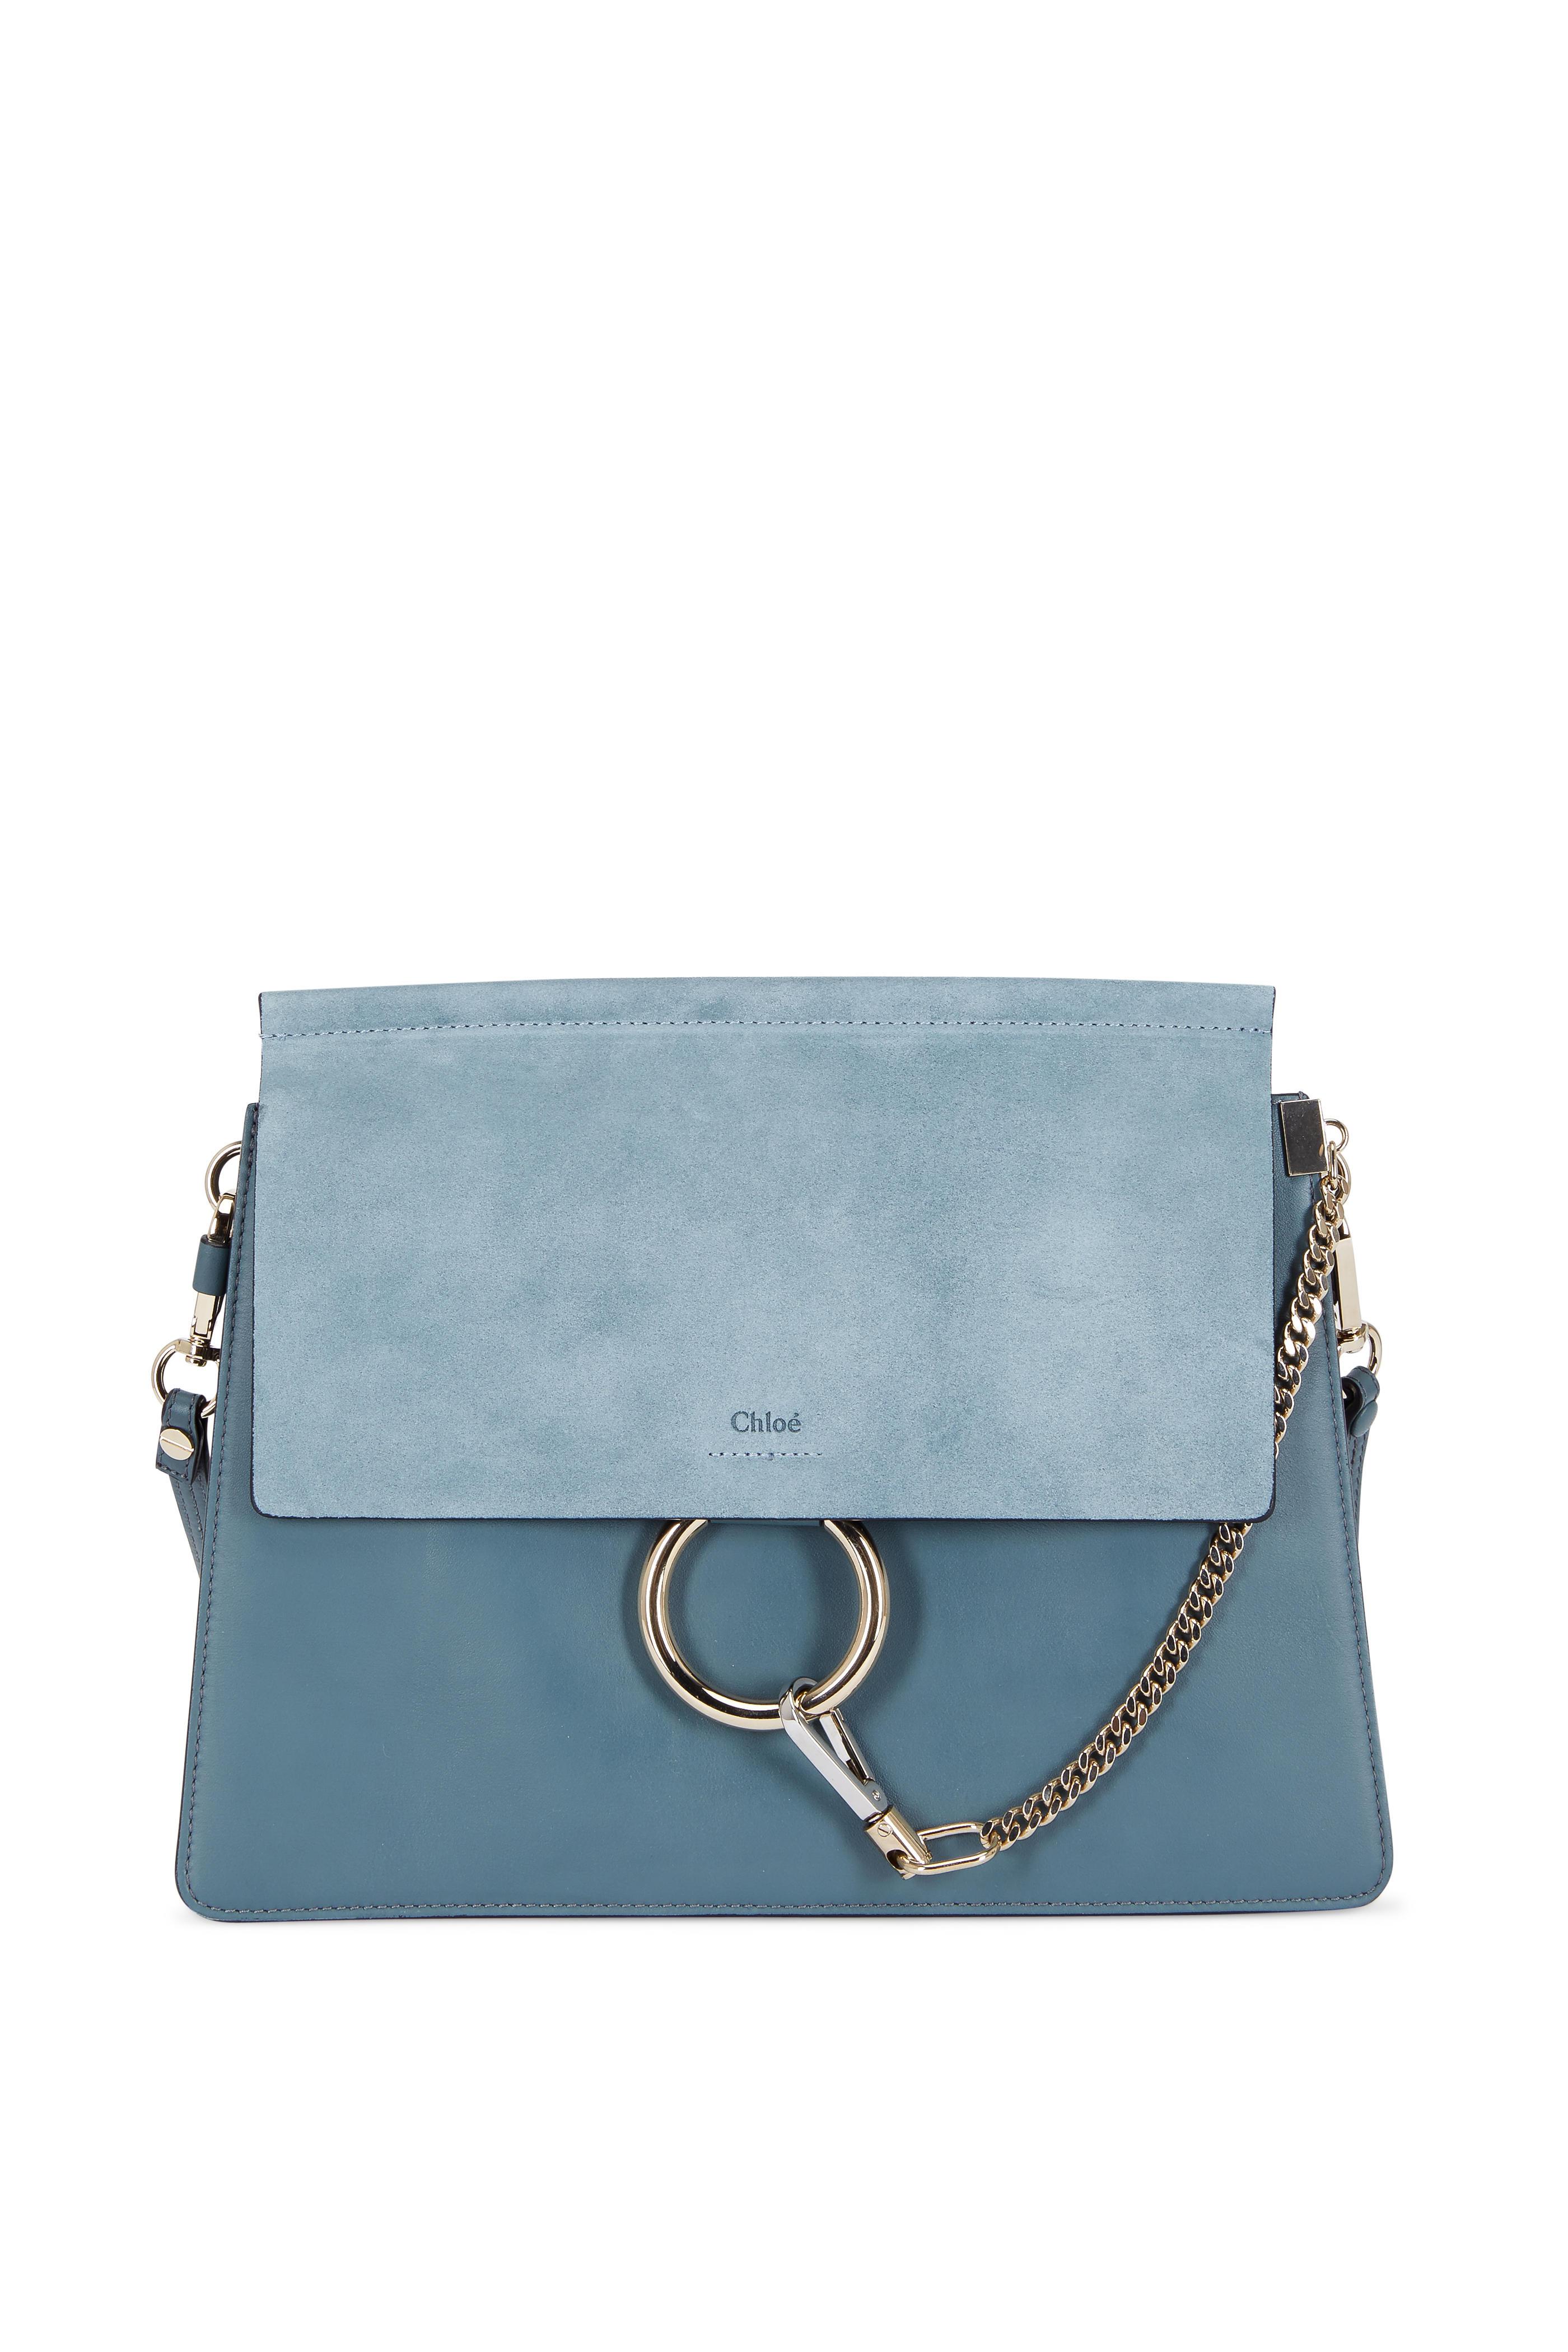 1b1d457735 Chloé - Faye Cloud Blue Leather & Suede Shoulder Bag | Mitchell Stores